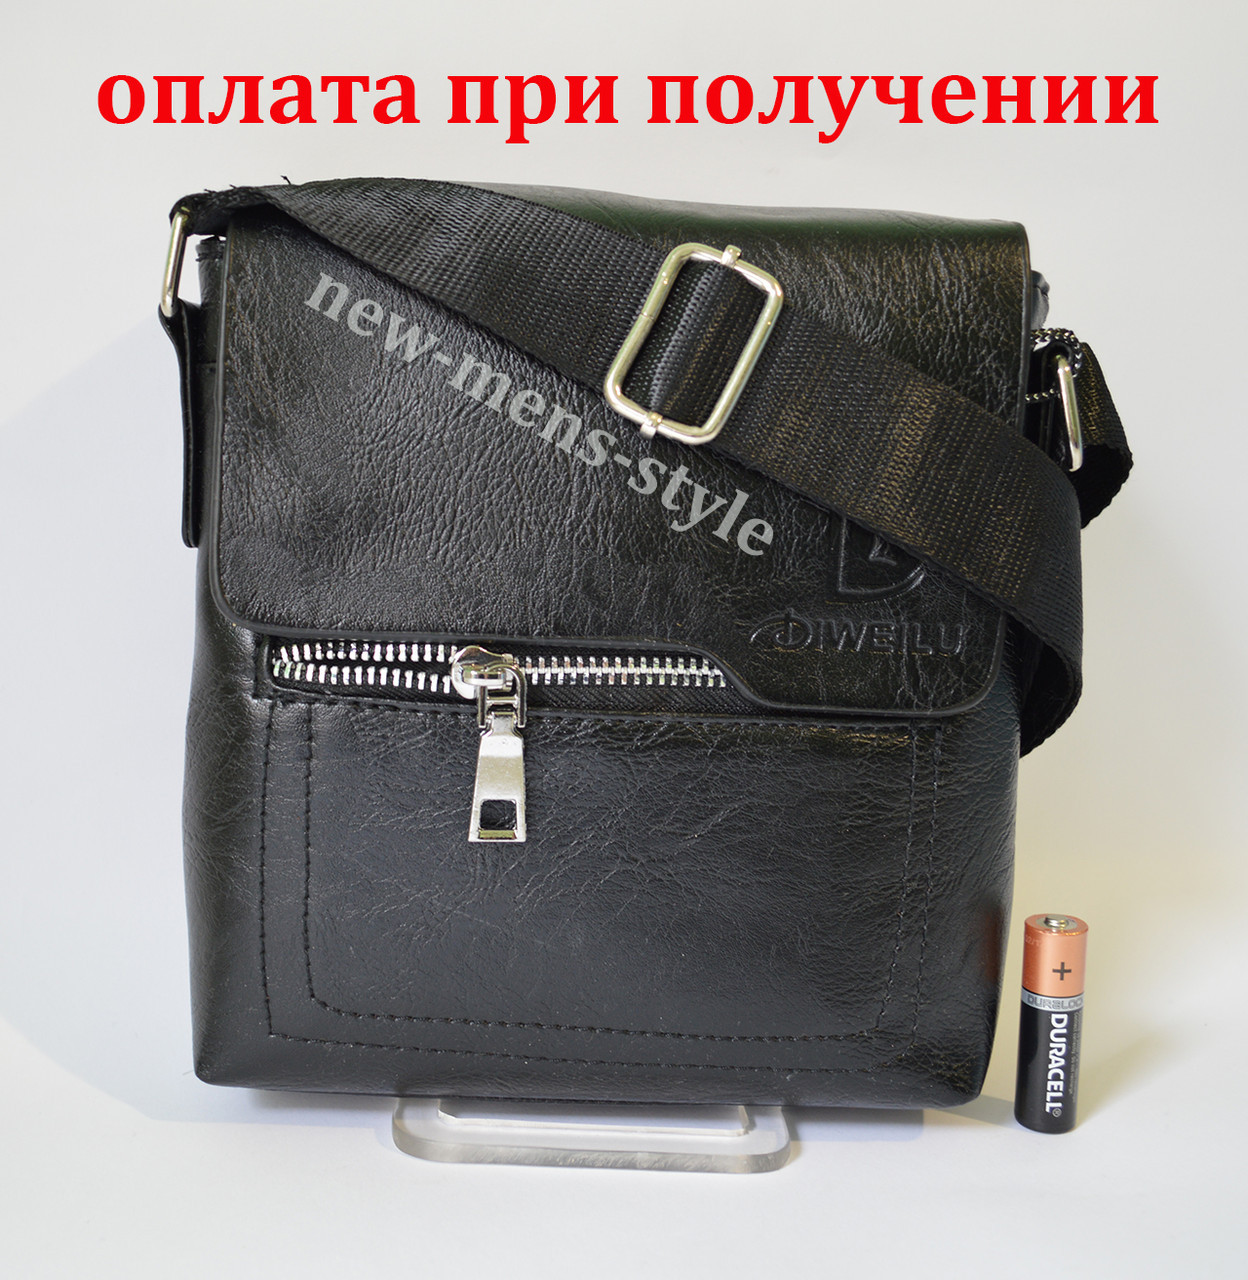 3be43166710e Мужская кожаная фирменная сумка барсетка DIWEILU Polo классика купить - На  Стиле в Бердянске